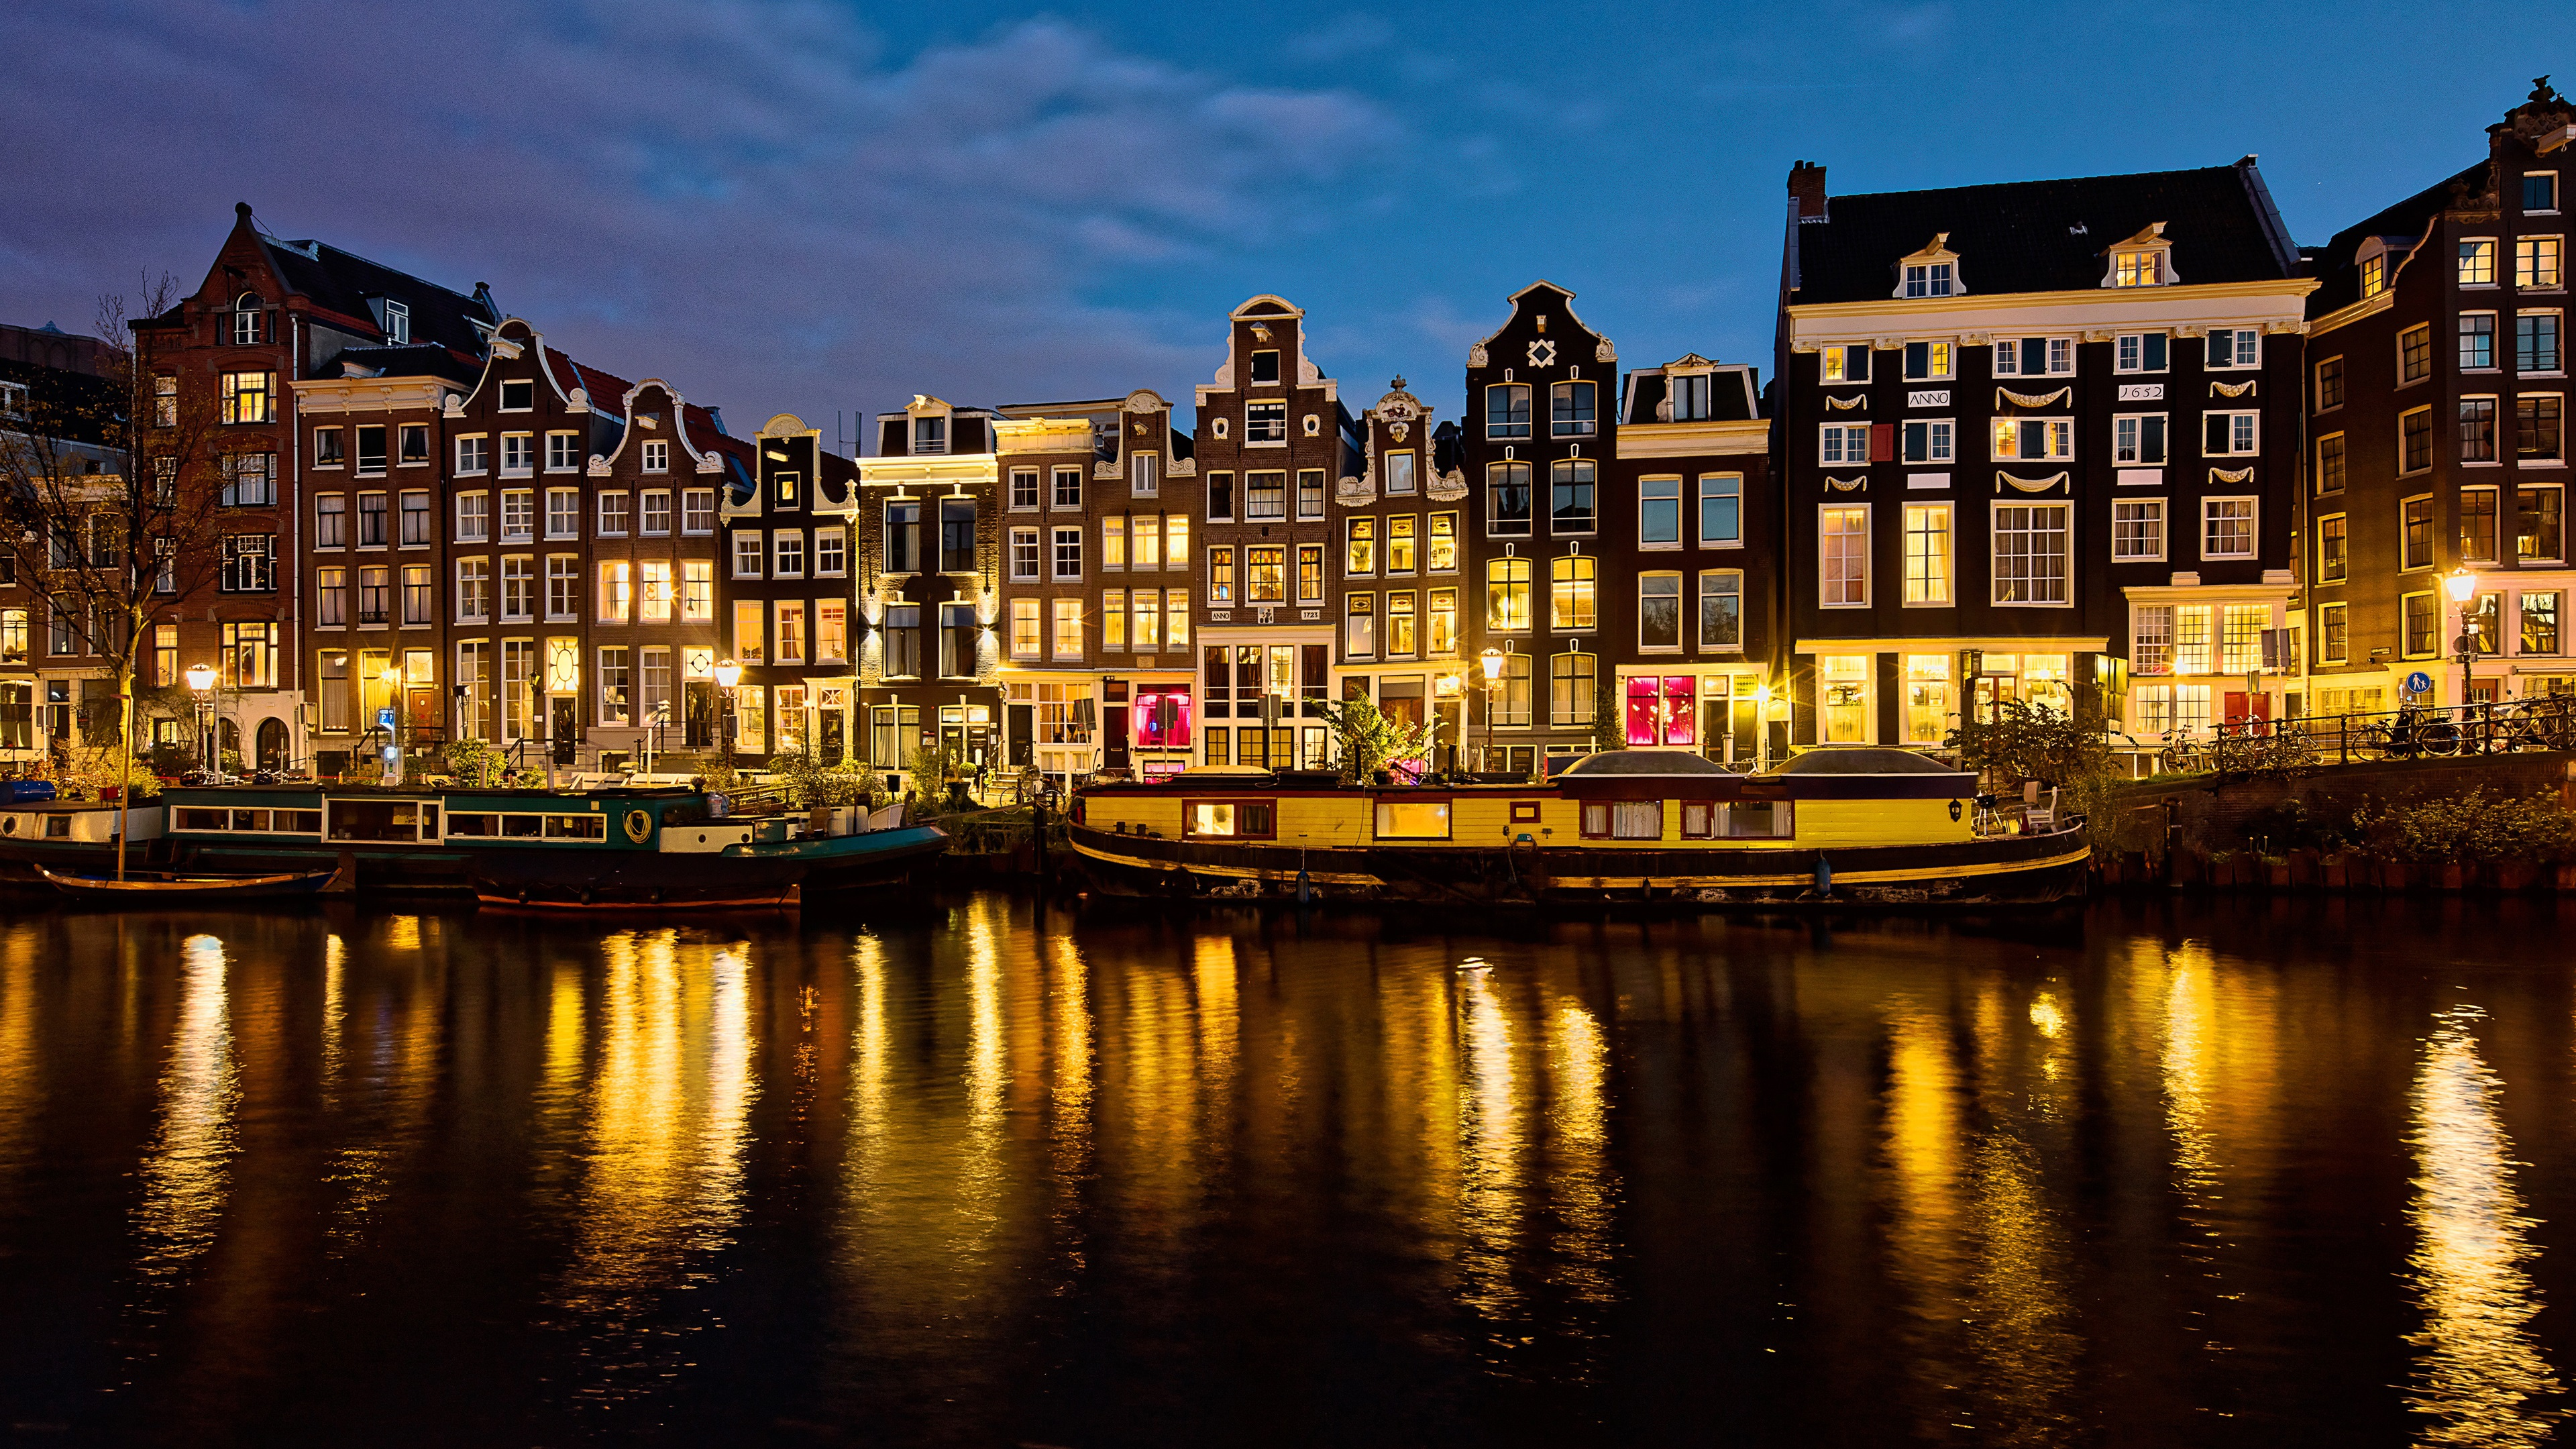 download 2016 amsterdam 4k - photo #45